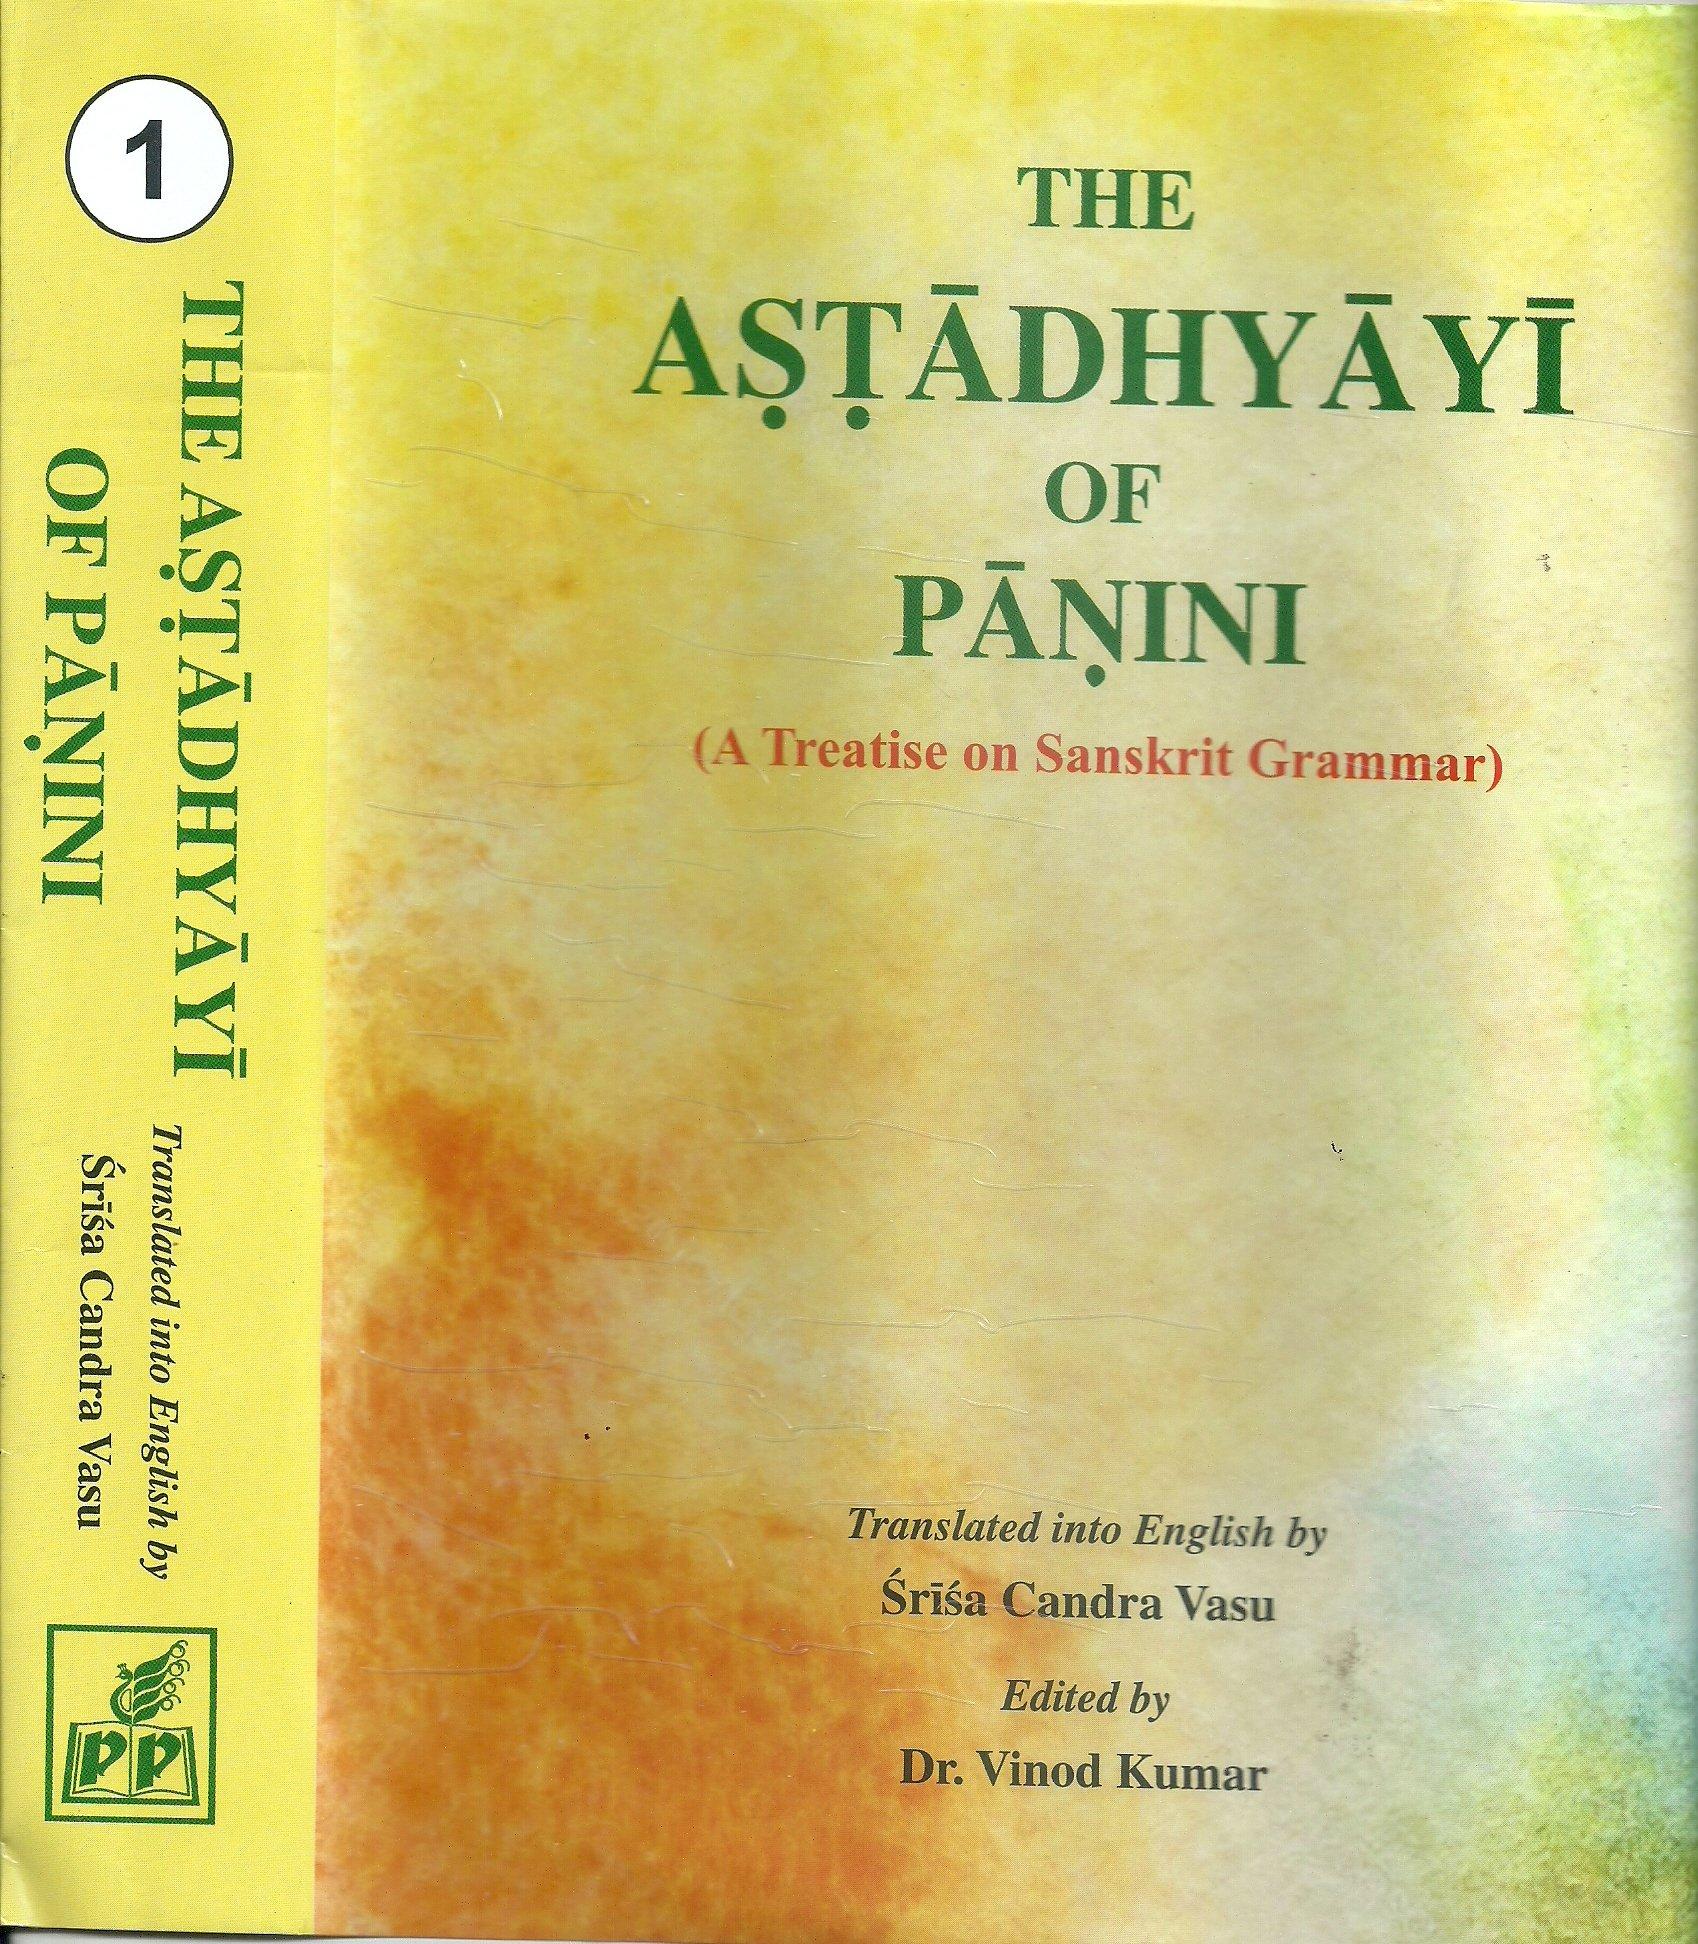 Buy The Astadhyayi of Panini - A Treatise on Sanskrit